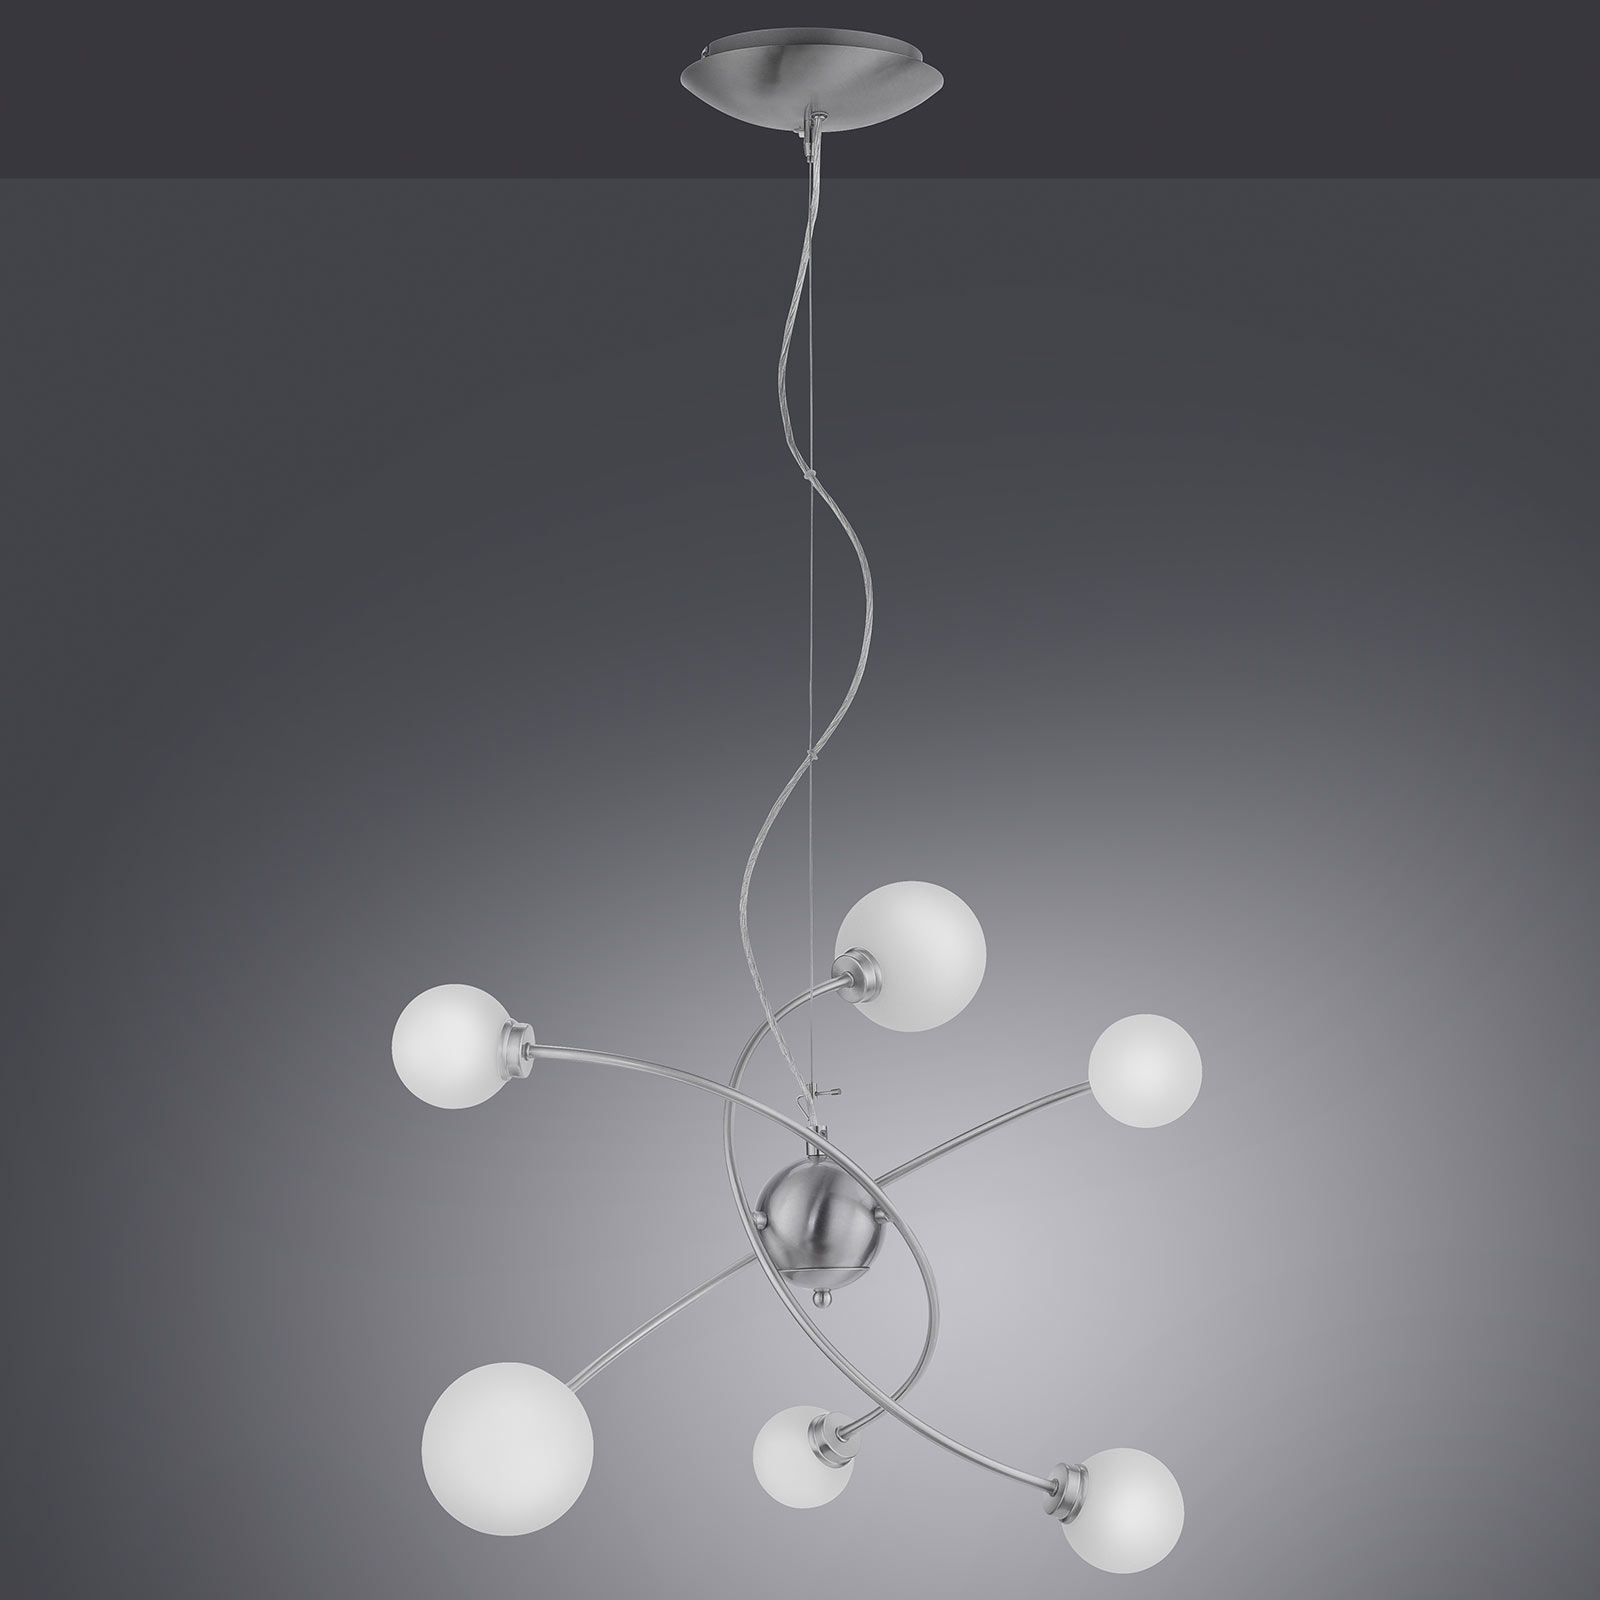 Trio WiZ Dicapo LED-Pendelleuchte, sechsflammig